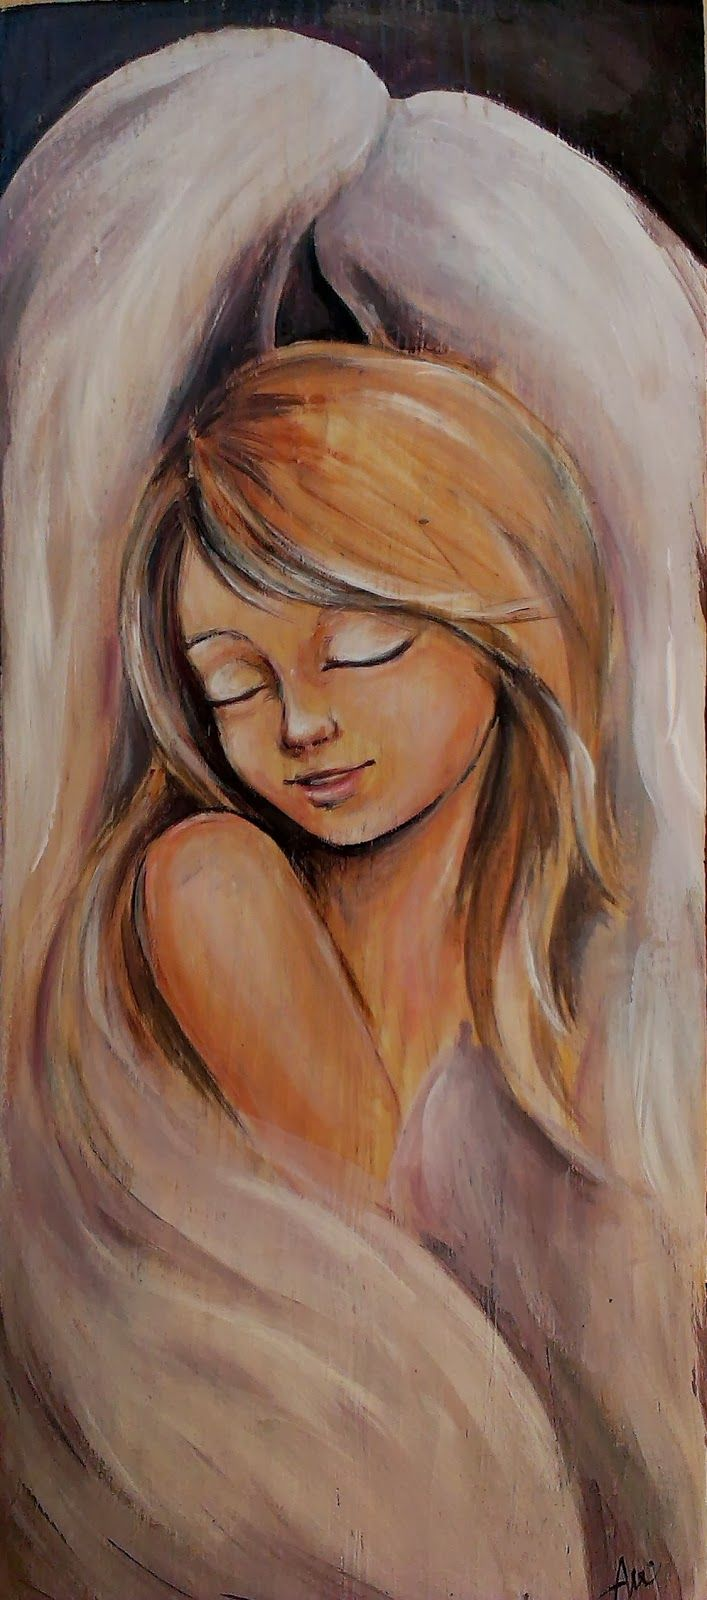 Anielska delikatność  angel acrylic painting on wood